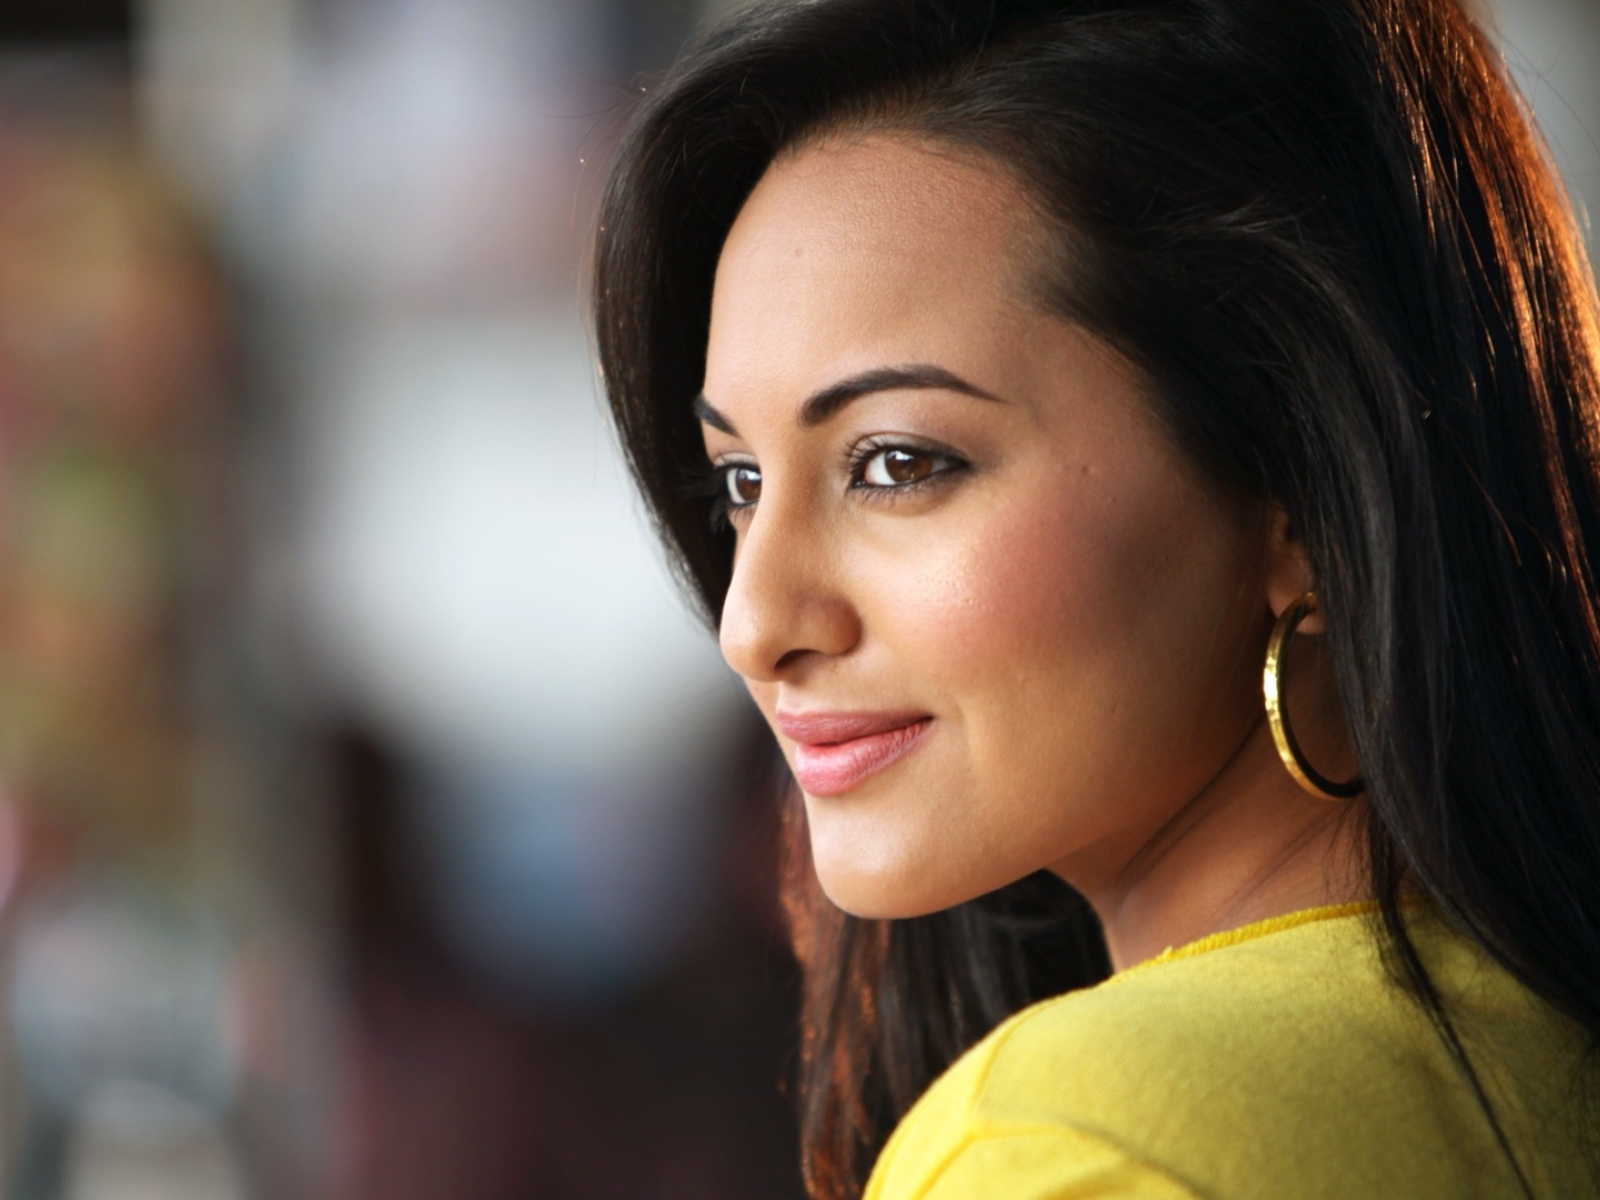 Sonakshi Sinha Cute Smile Photoshoot, Full HD Wallpaper